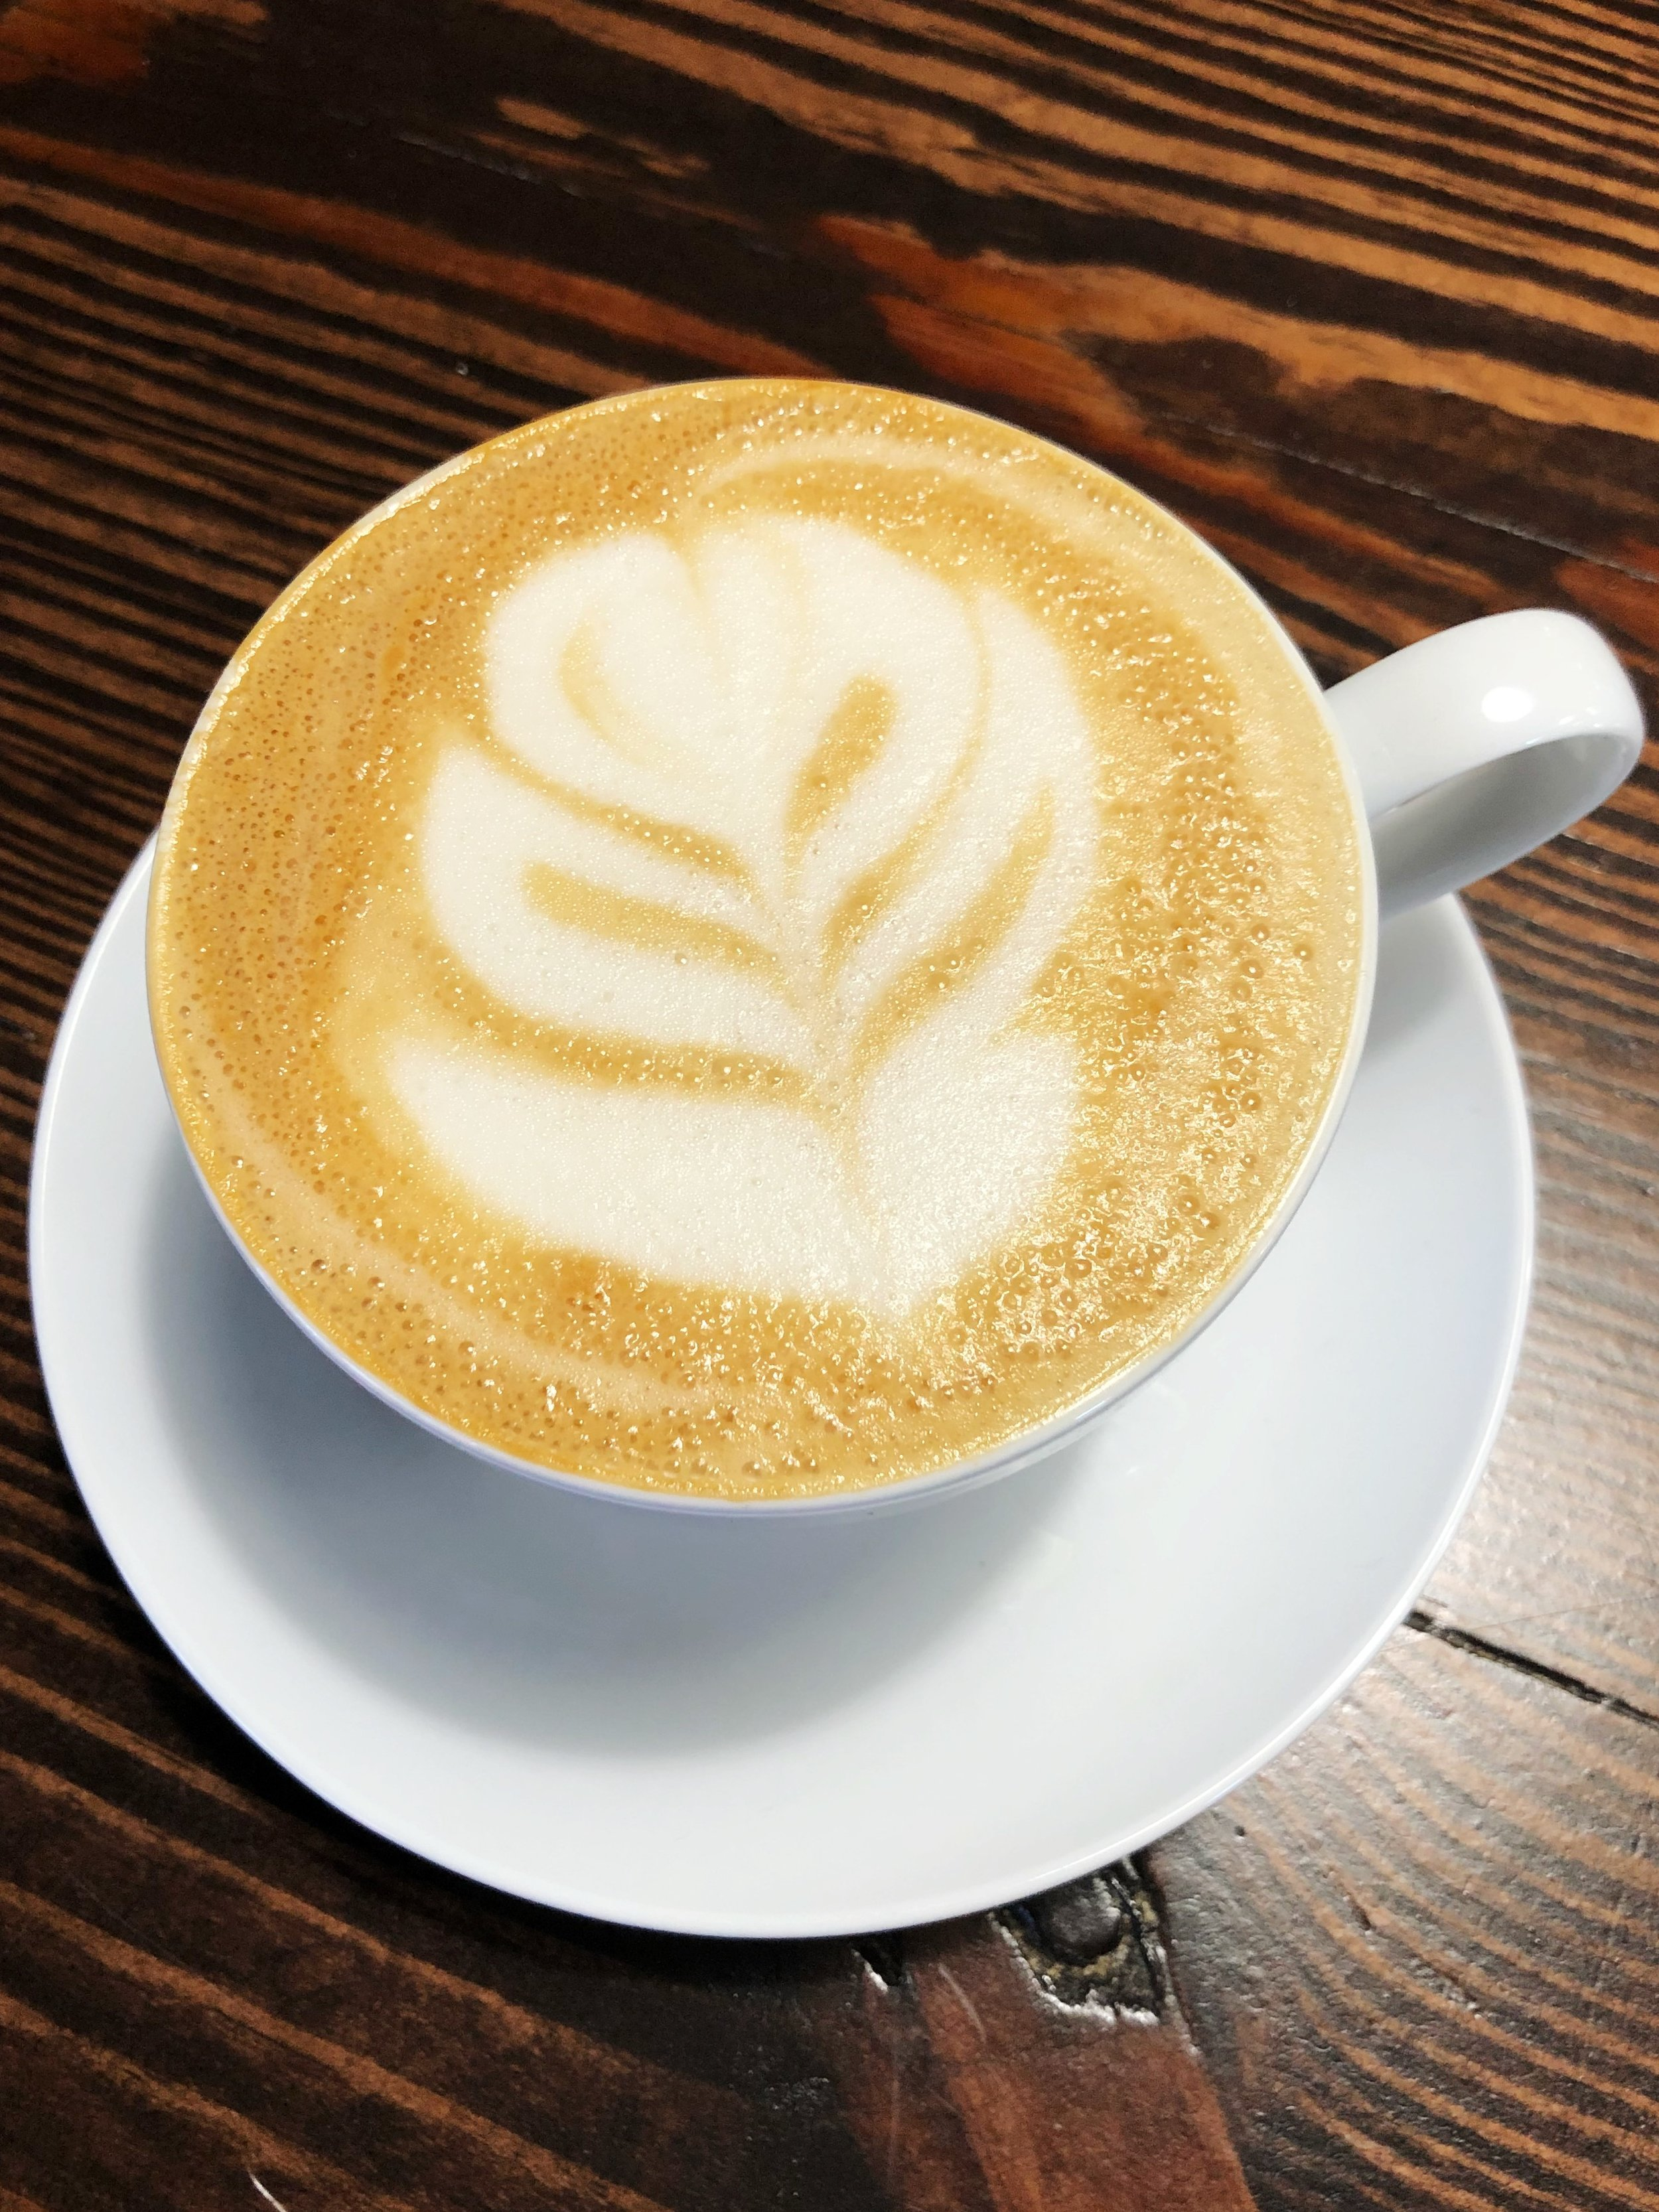 pistachio-rosewater-latte-oak-milk-trade-and-lore-noda-charlotte-nc